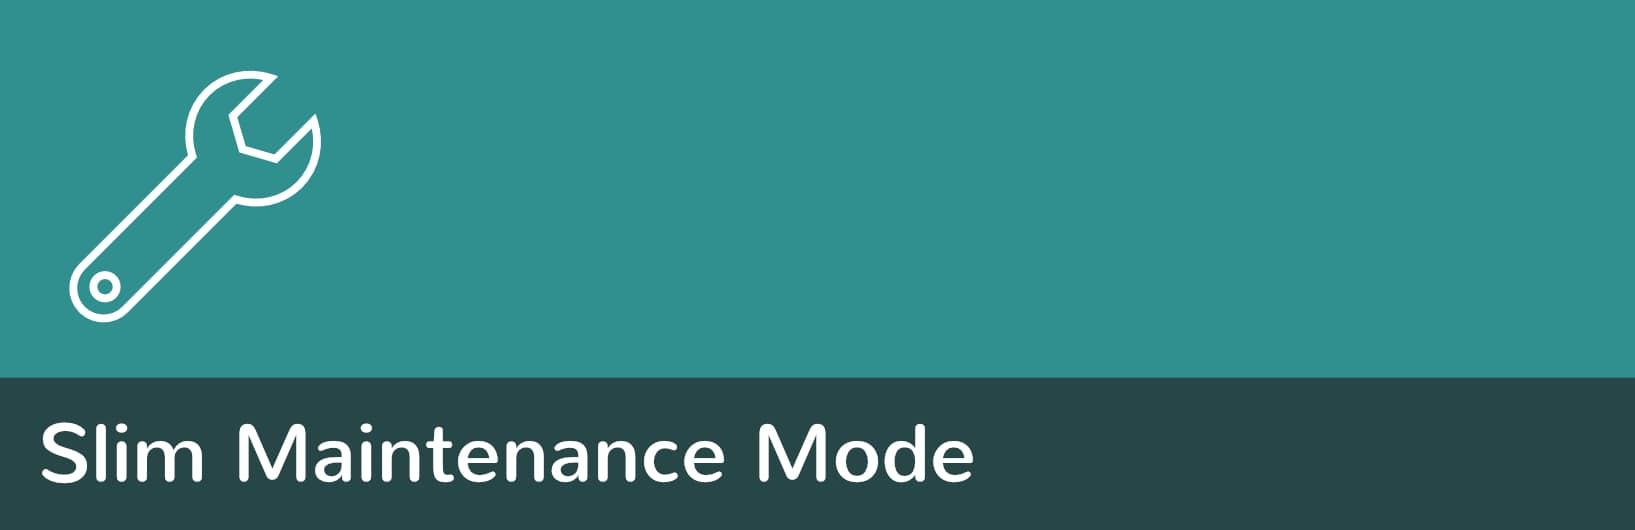 Slim-Maintenance-Mode